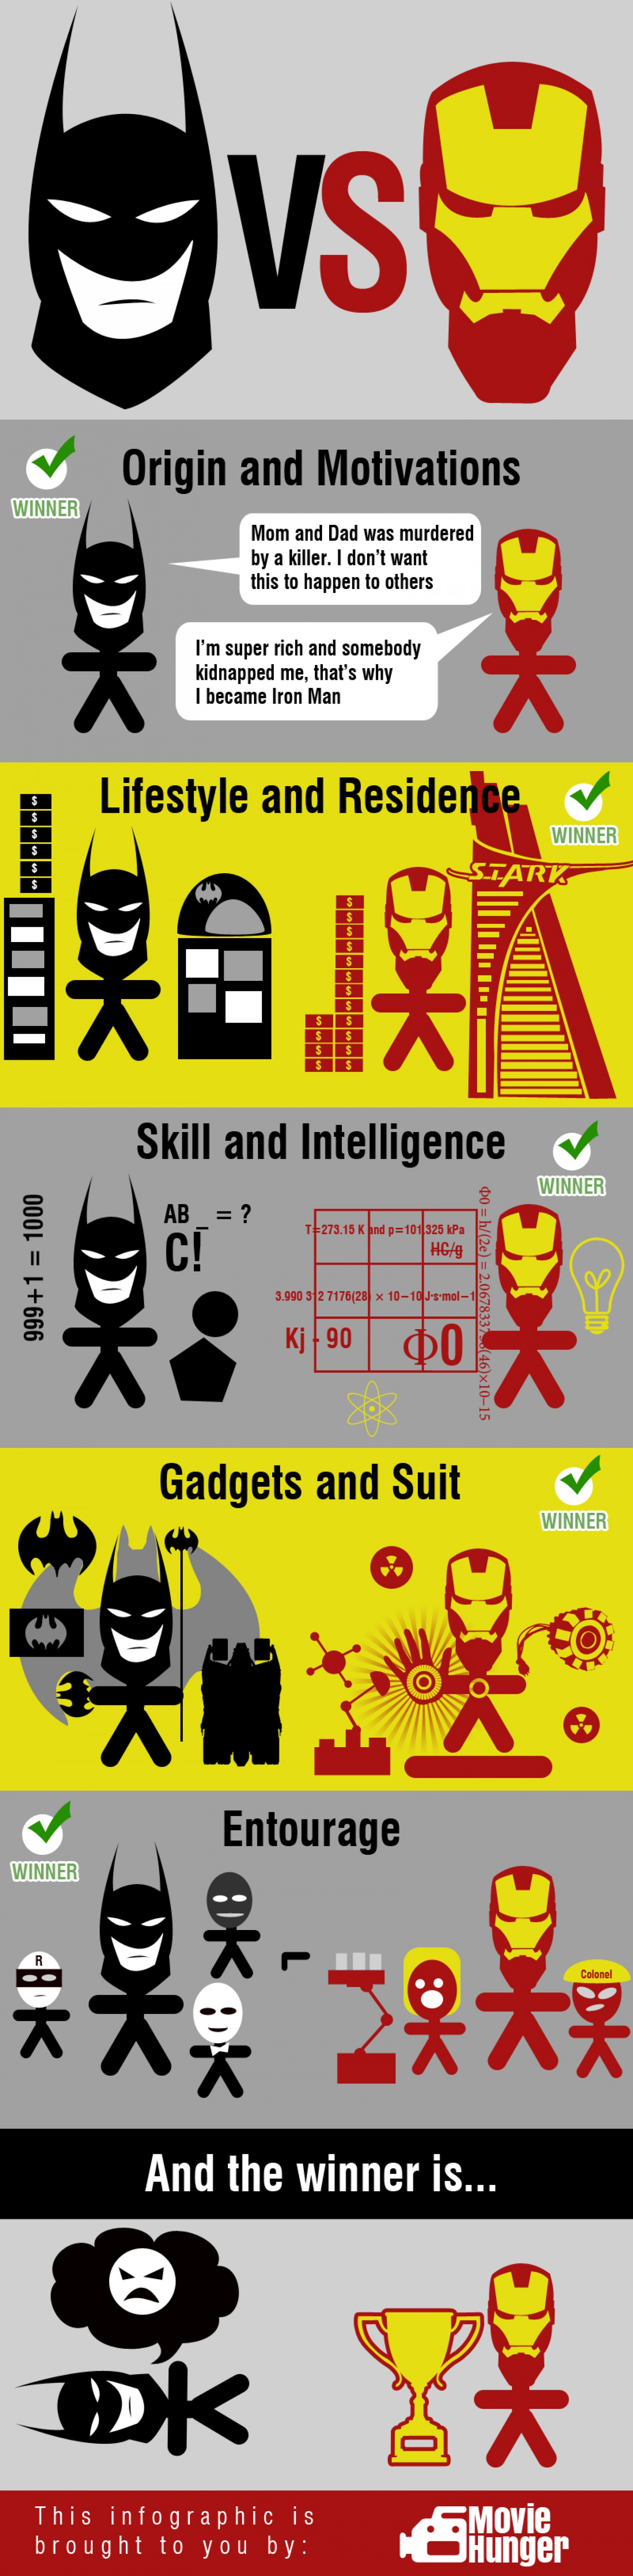 batman-vs-iron-man_528a1360bb272_w1500